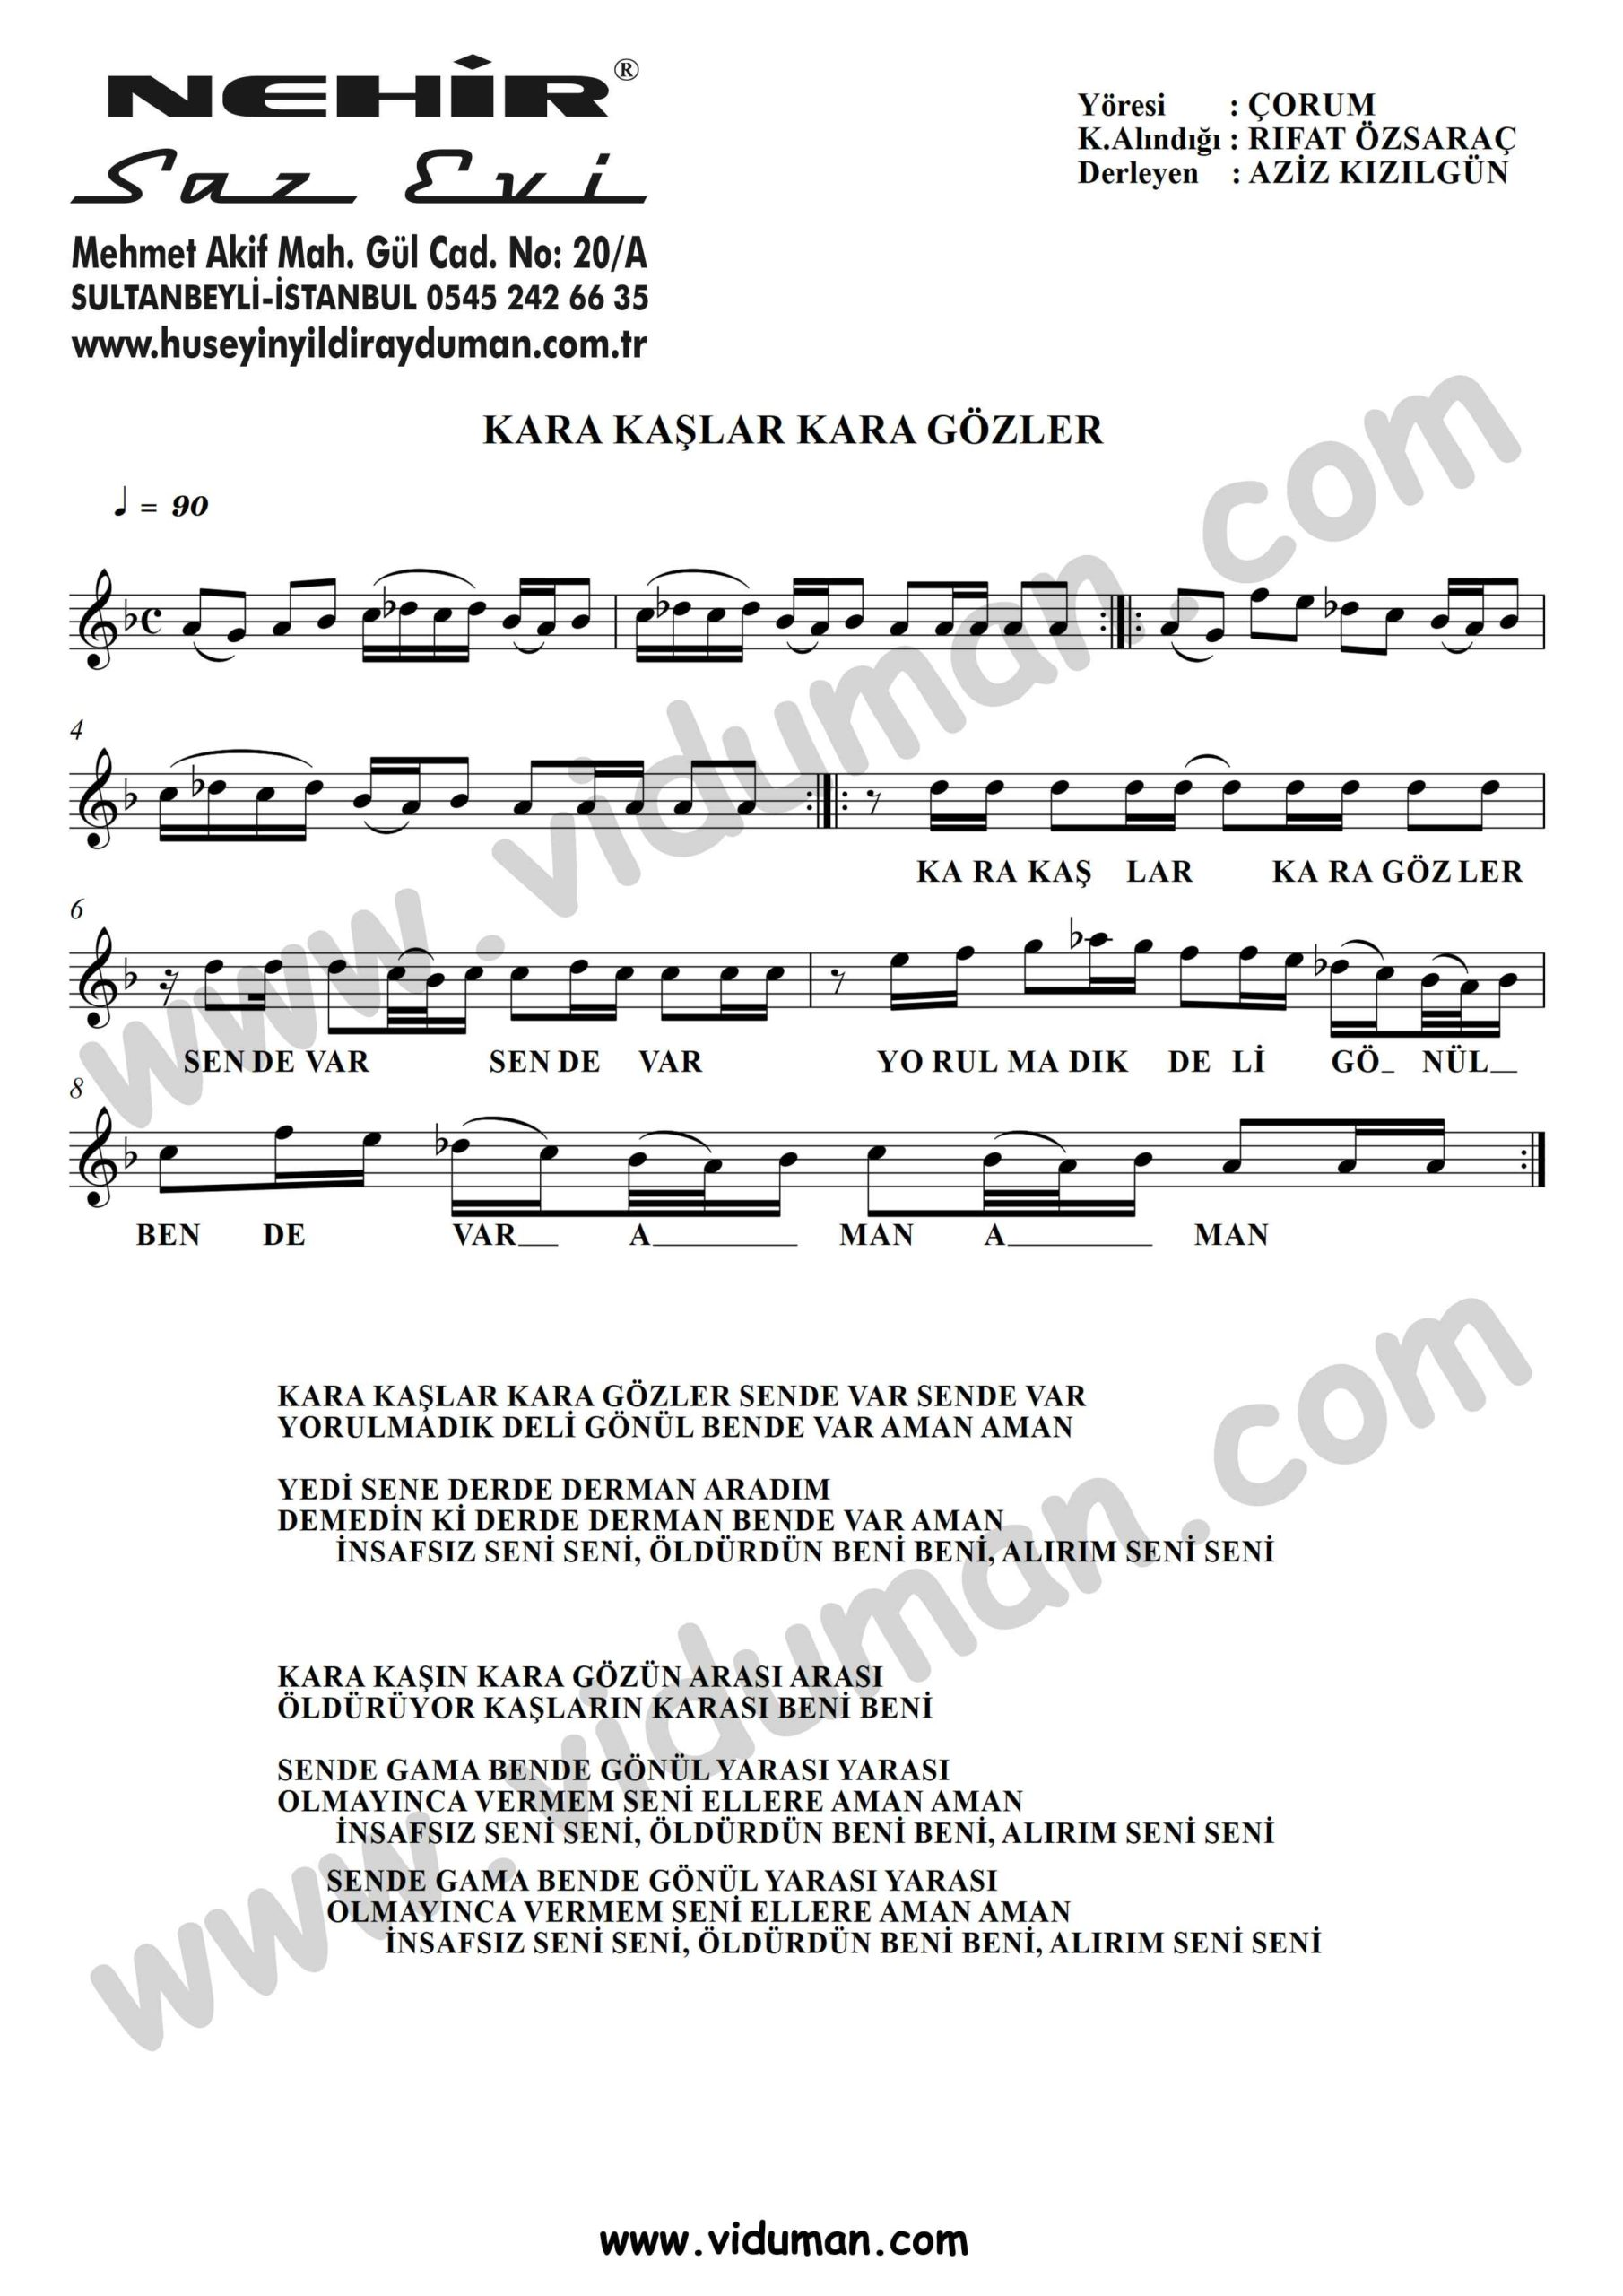 Kara Kaslar Kara Gozler-Baglama-Saz-Notalari